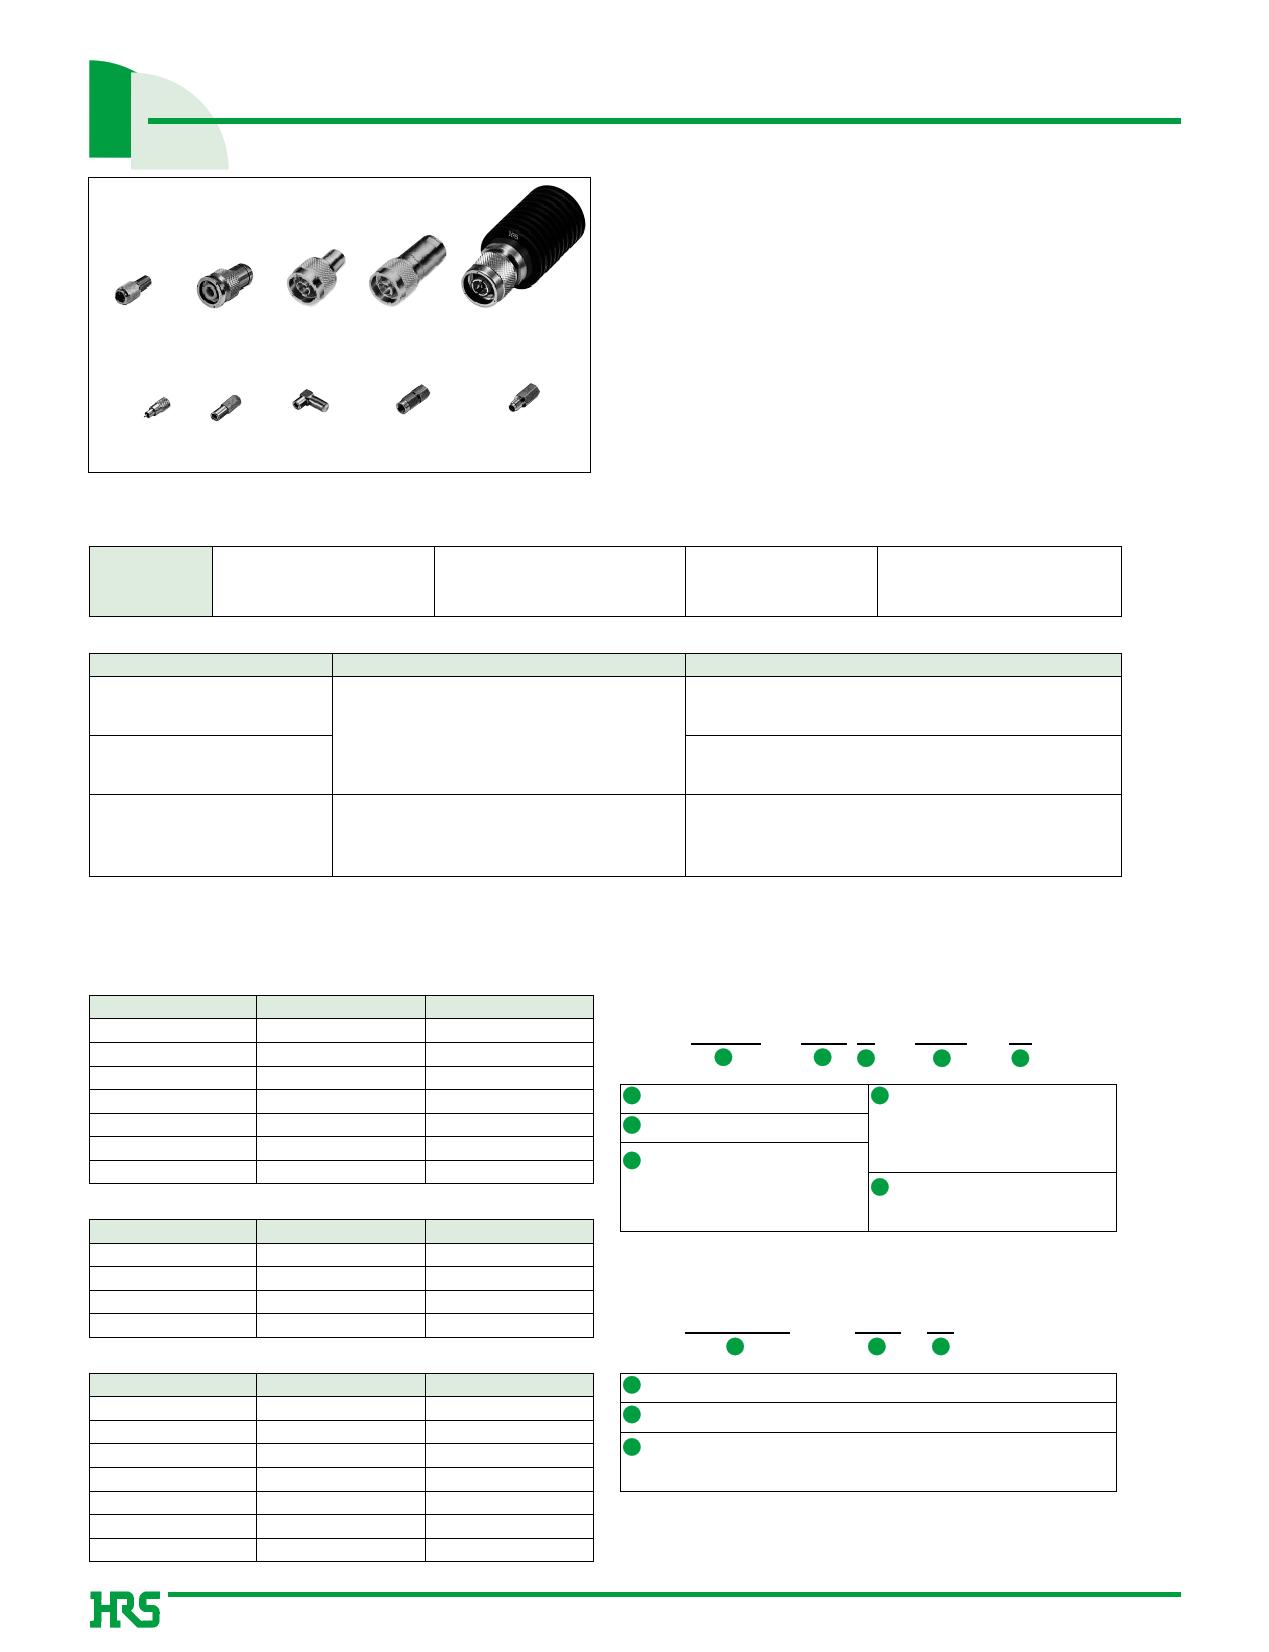 N-TMP-1-1 datasheet